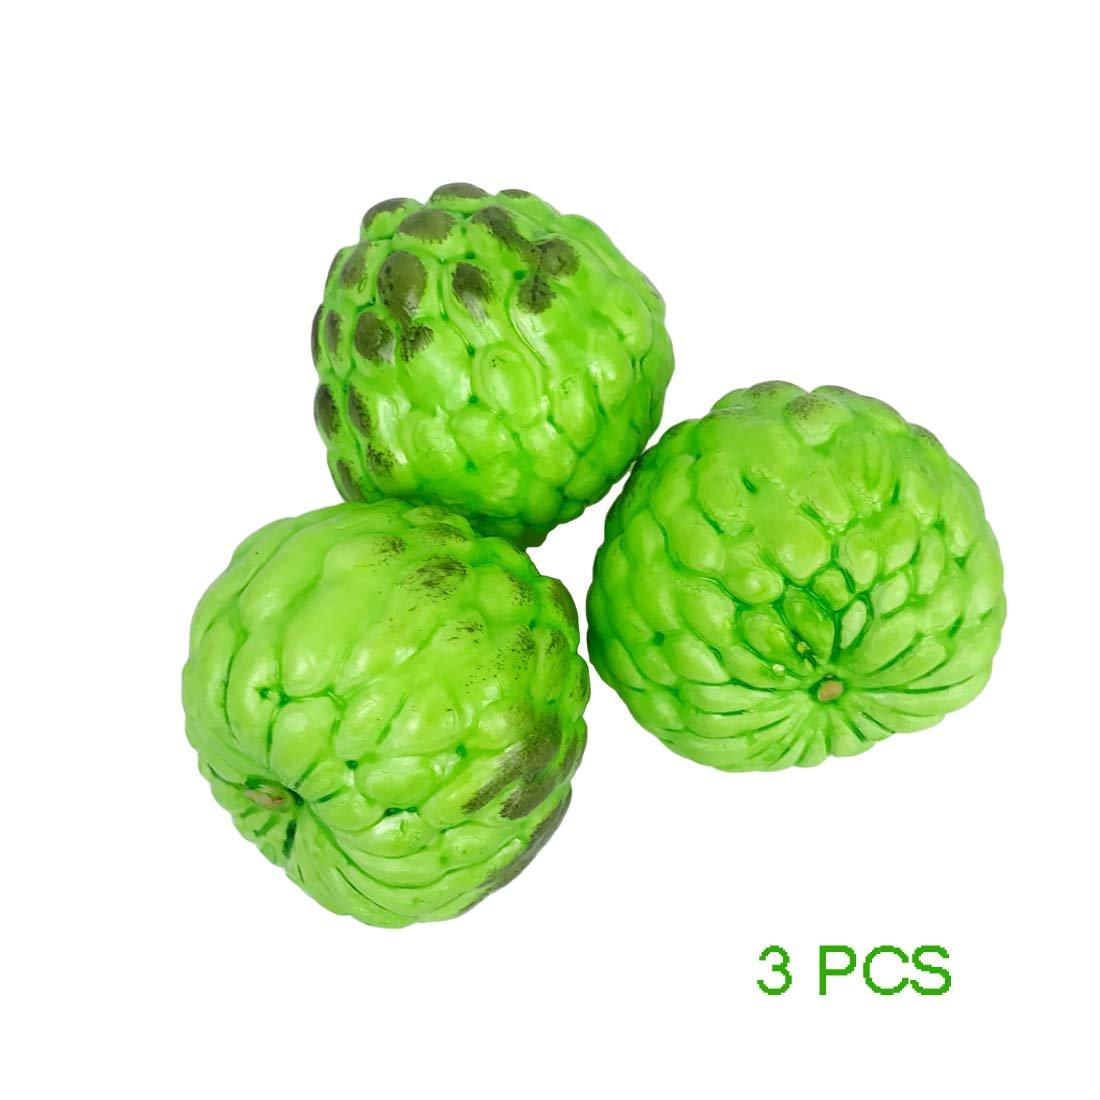 Cheap Cherimoya Fruit, find Cherimoya Fruit deals on line at Alibaba com